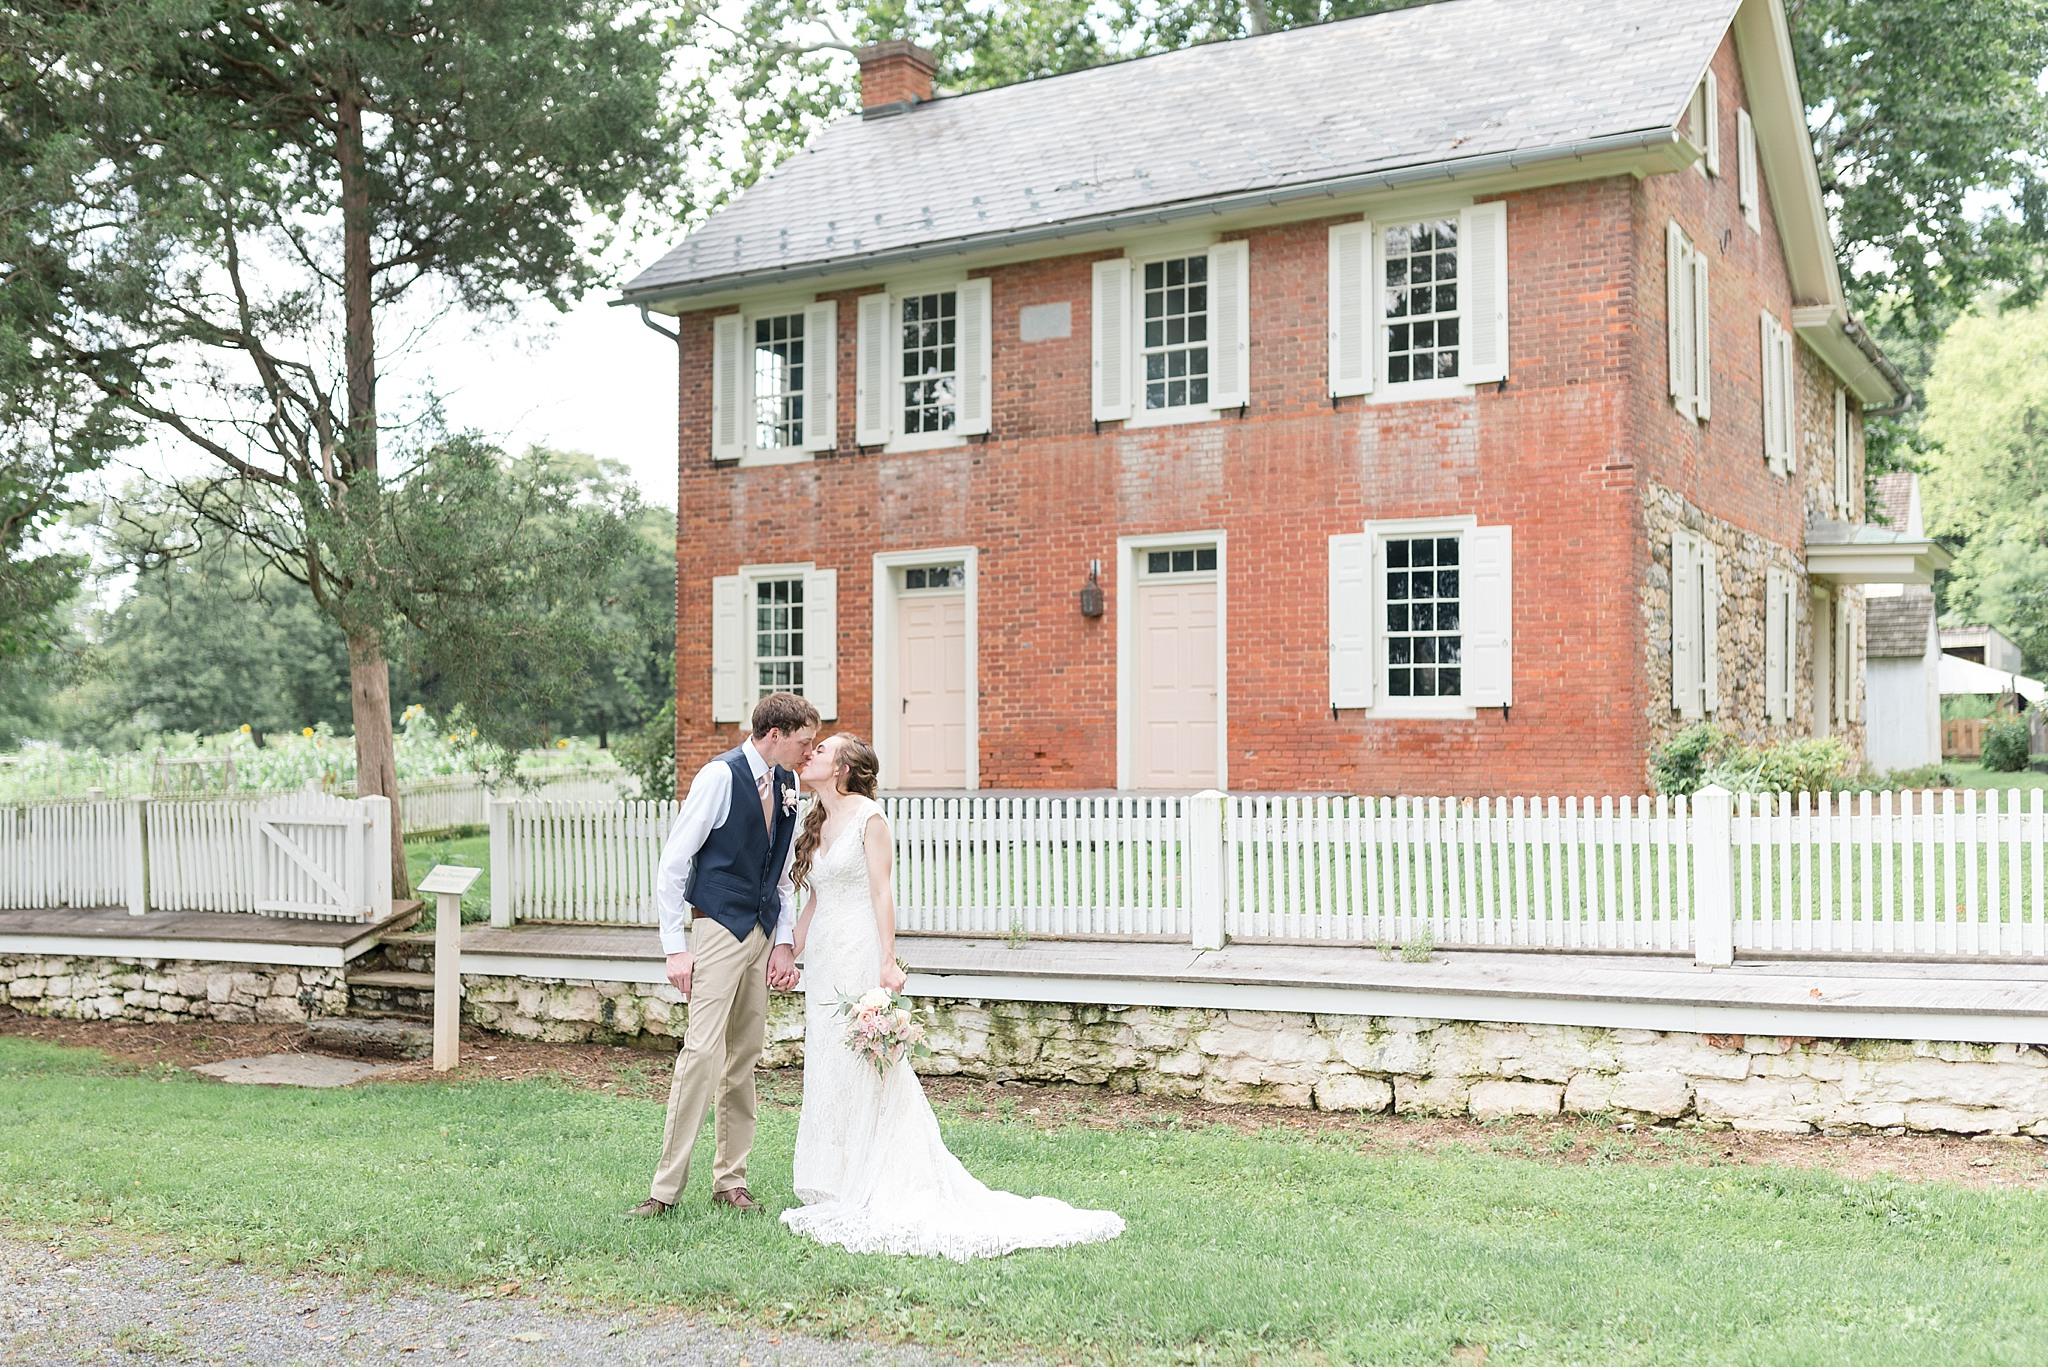 Romantic Summer wedding Landis Valley Museum Lancaster PA wedding photography John Deere Tractor_1950.jpg